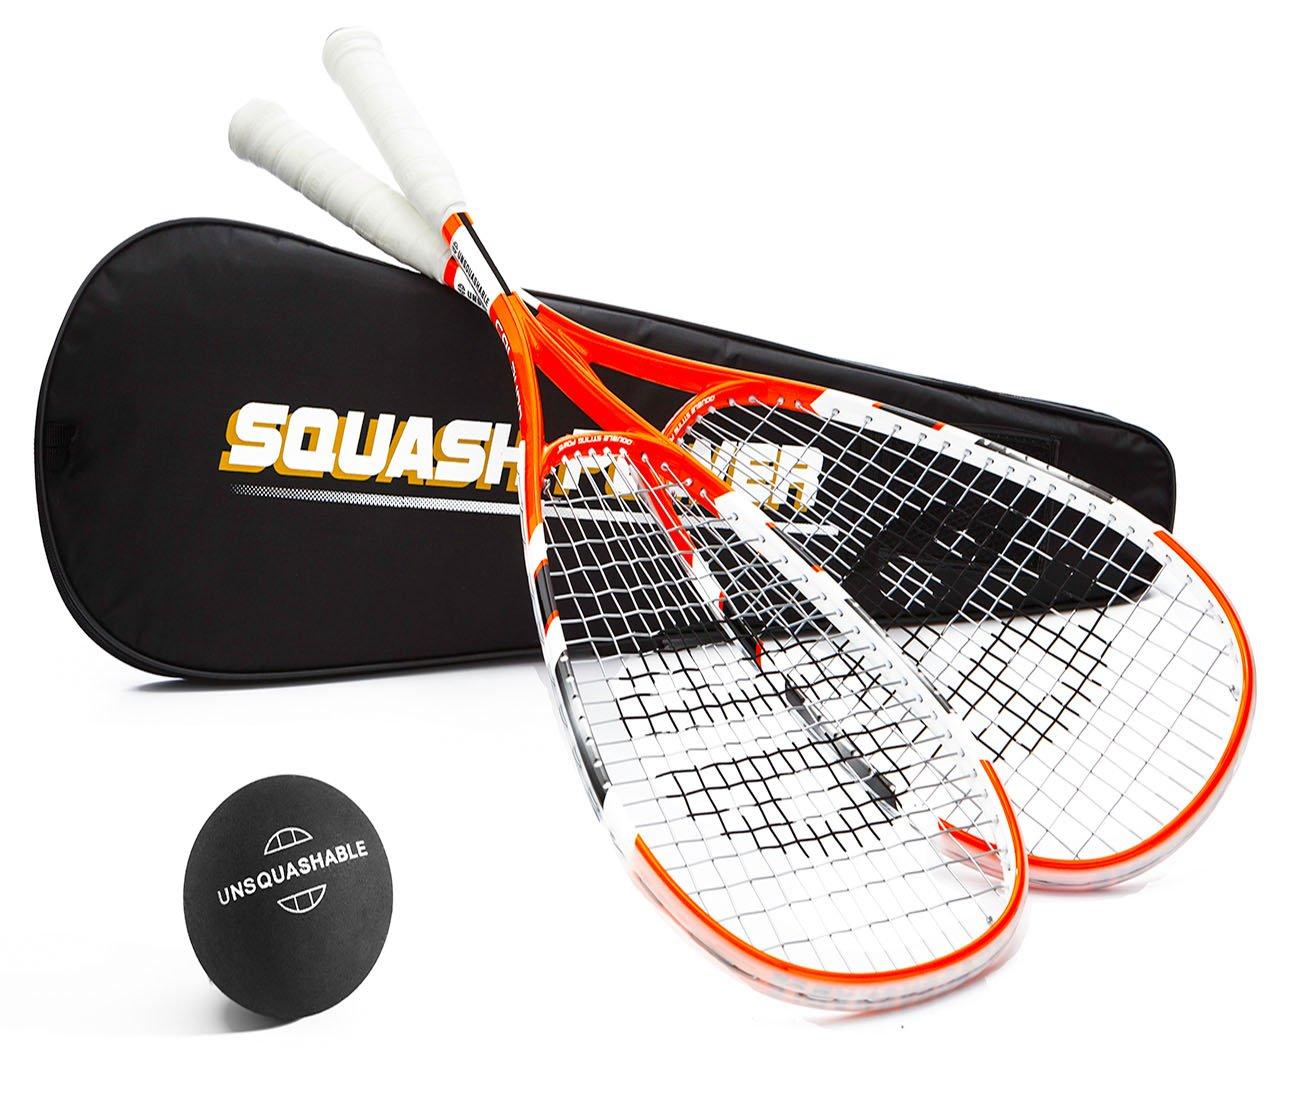 Unsquashable - Kit de squash (incluye 2 raquetas Calburn, 1 pelota ...